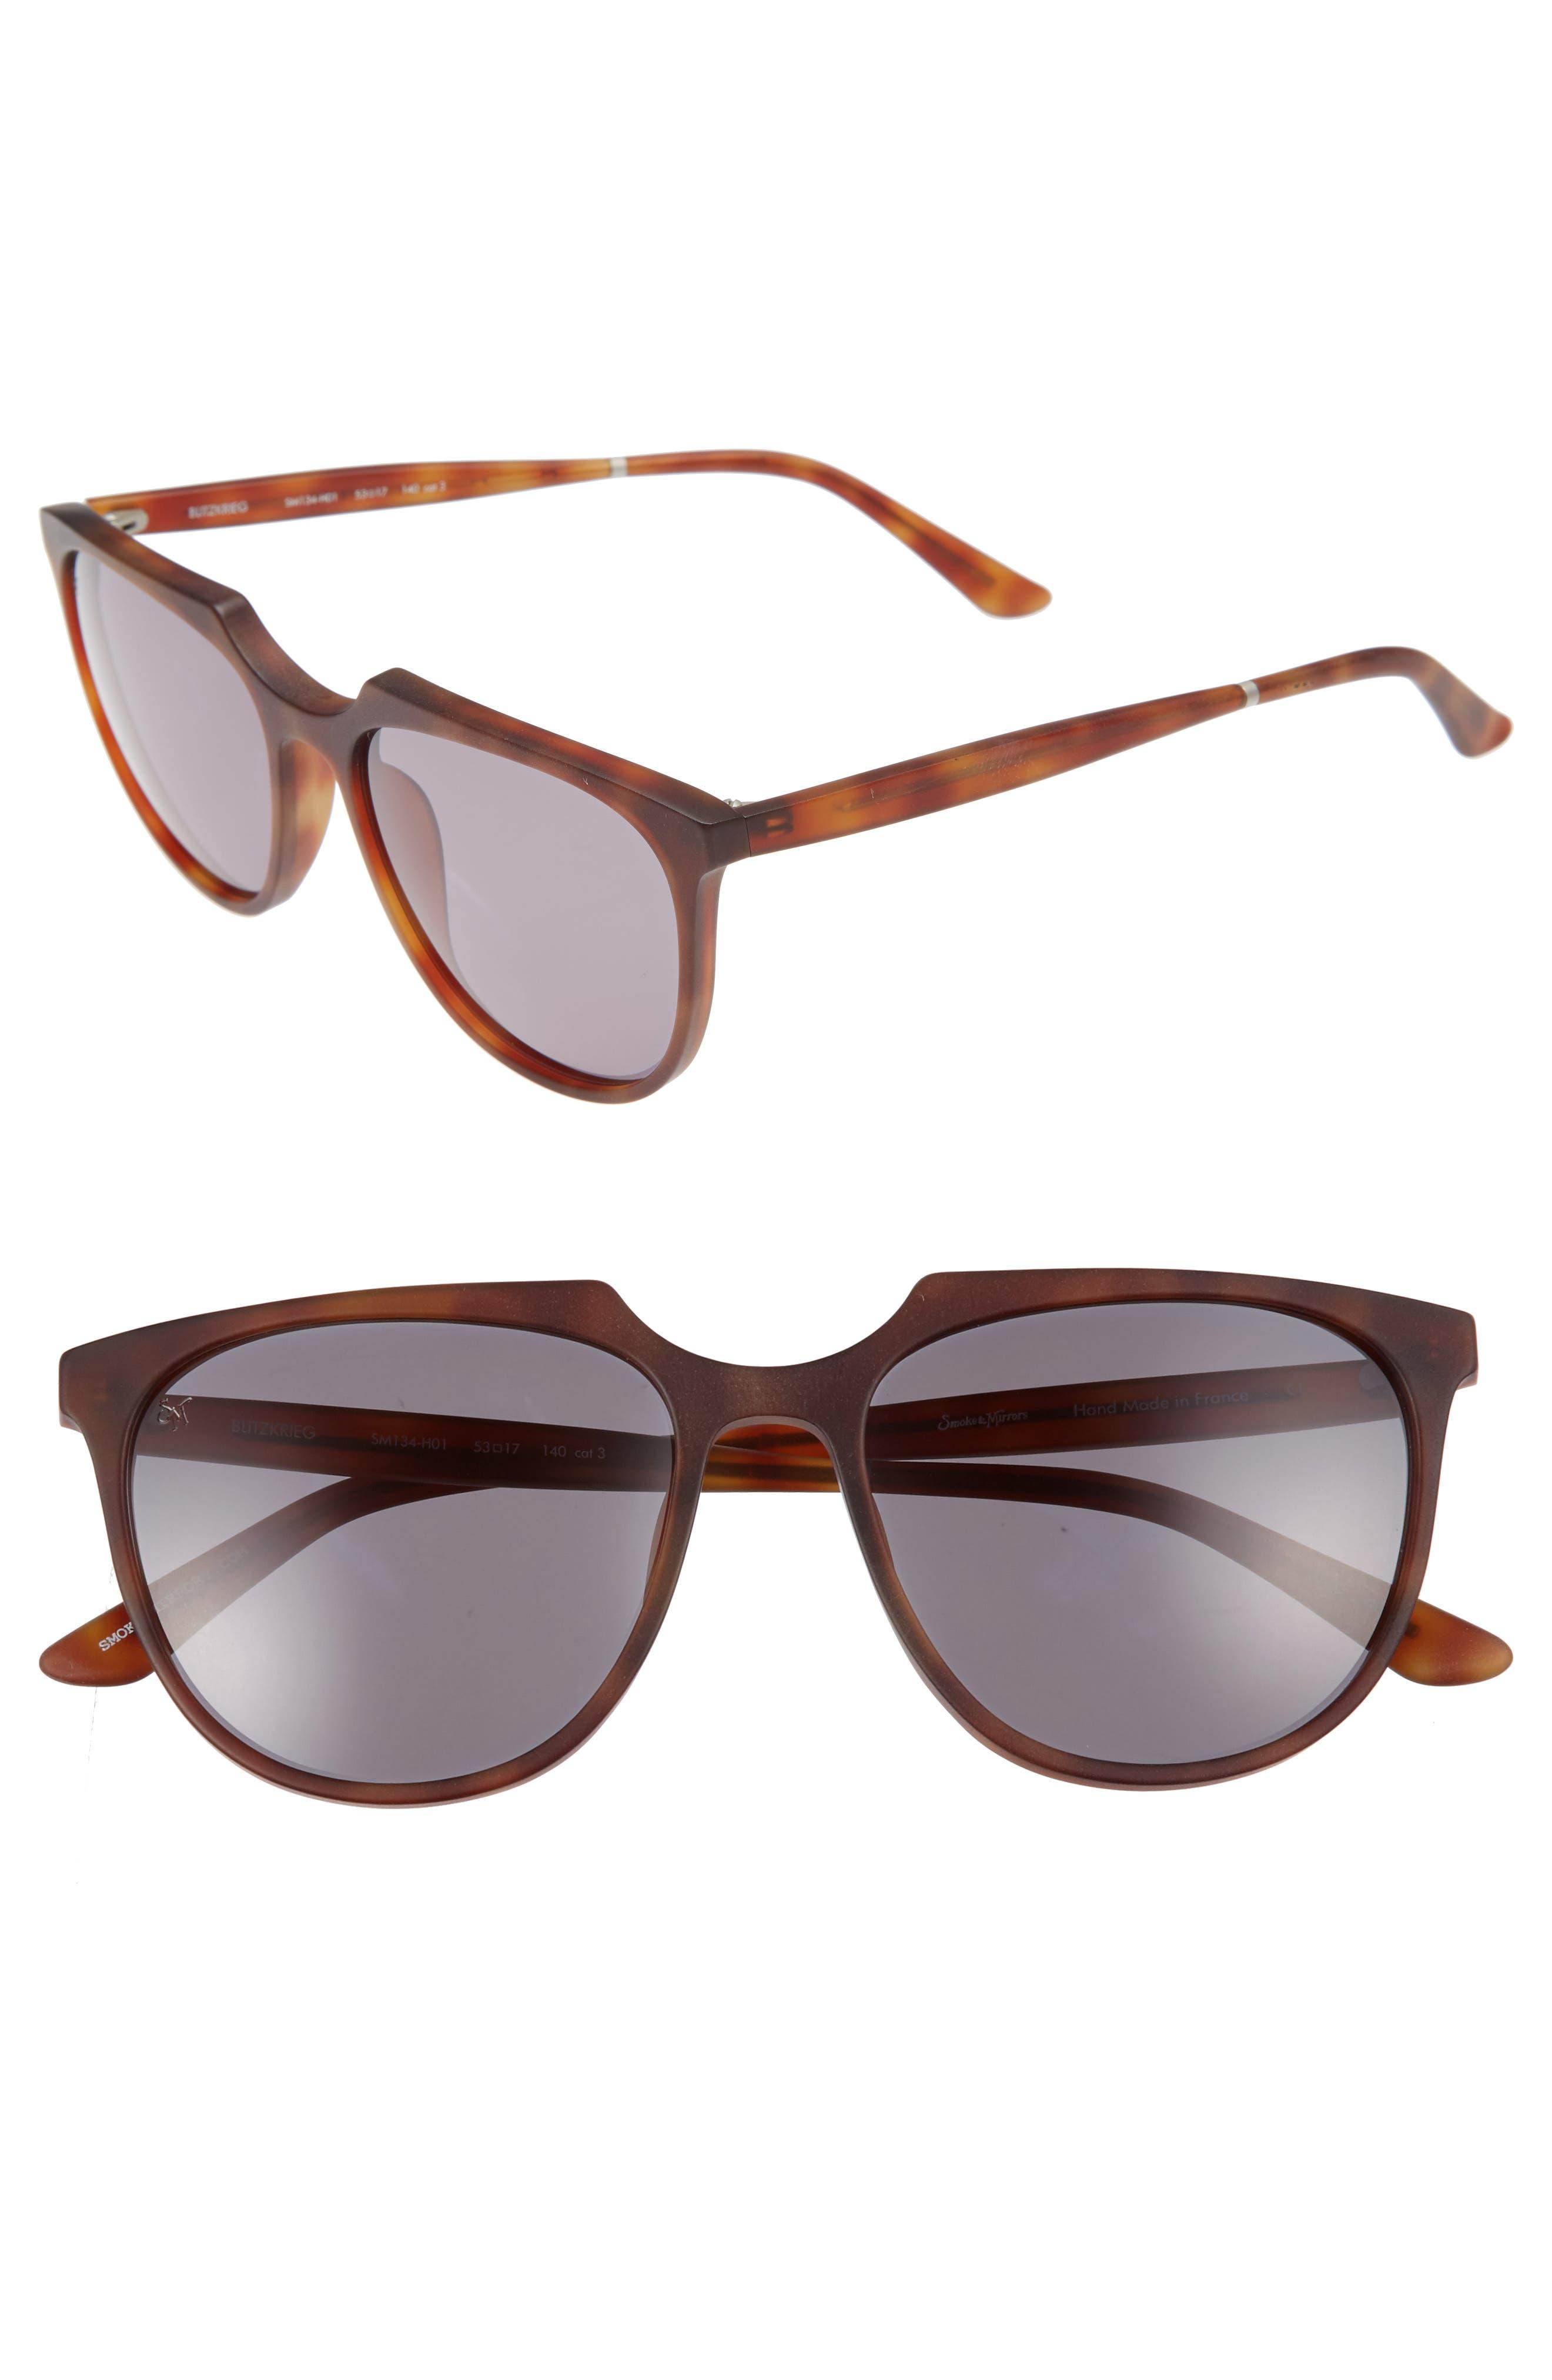 Main Image - SMOKE X MIRRORS Blitzkrieg 53mm Sunglasses